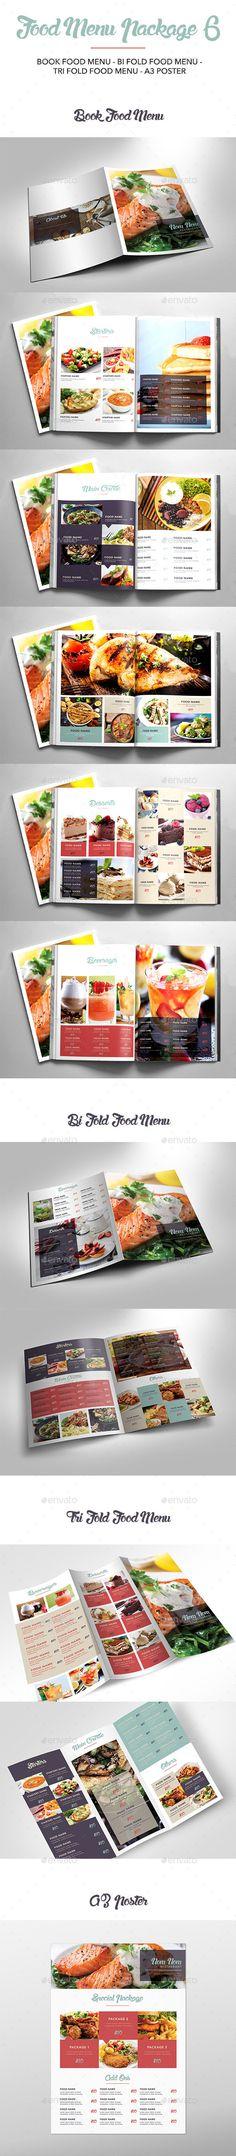 Food Menu Package Template InDesign INDD #design Download: http://graphicriver.net/item/food-menu-package-6/14390813?ref=ksioks